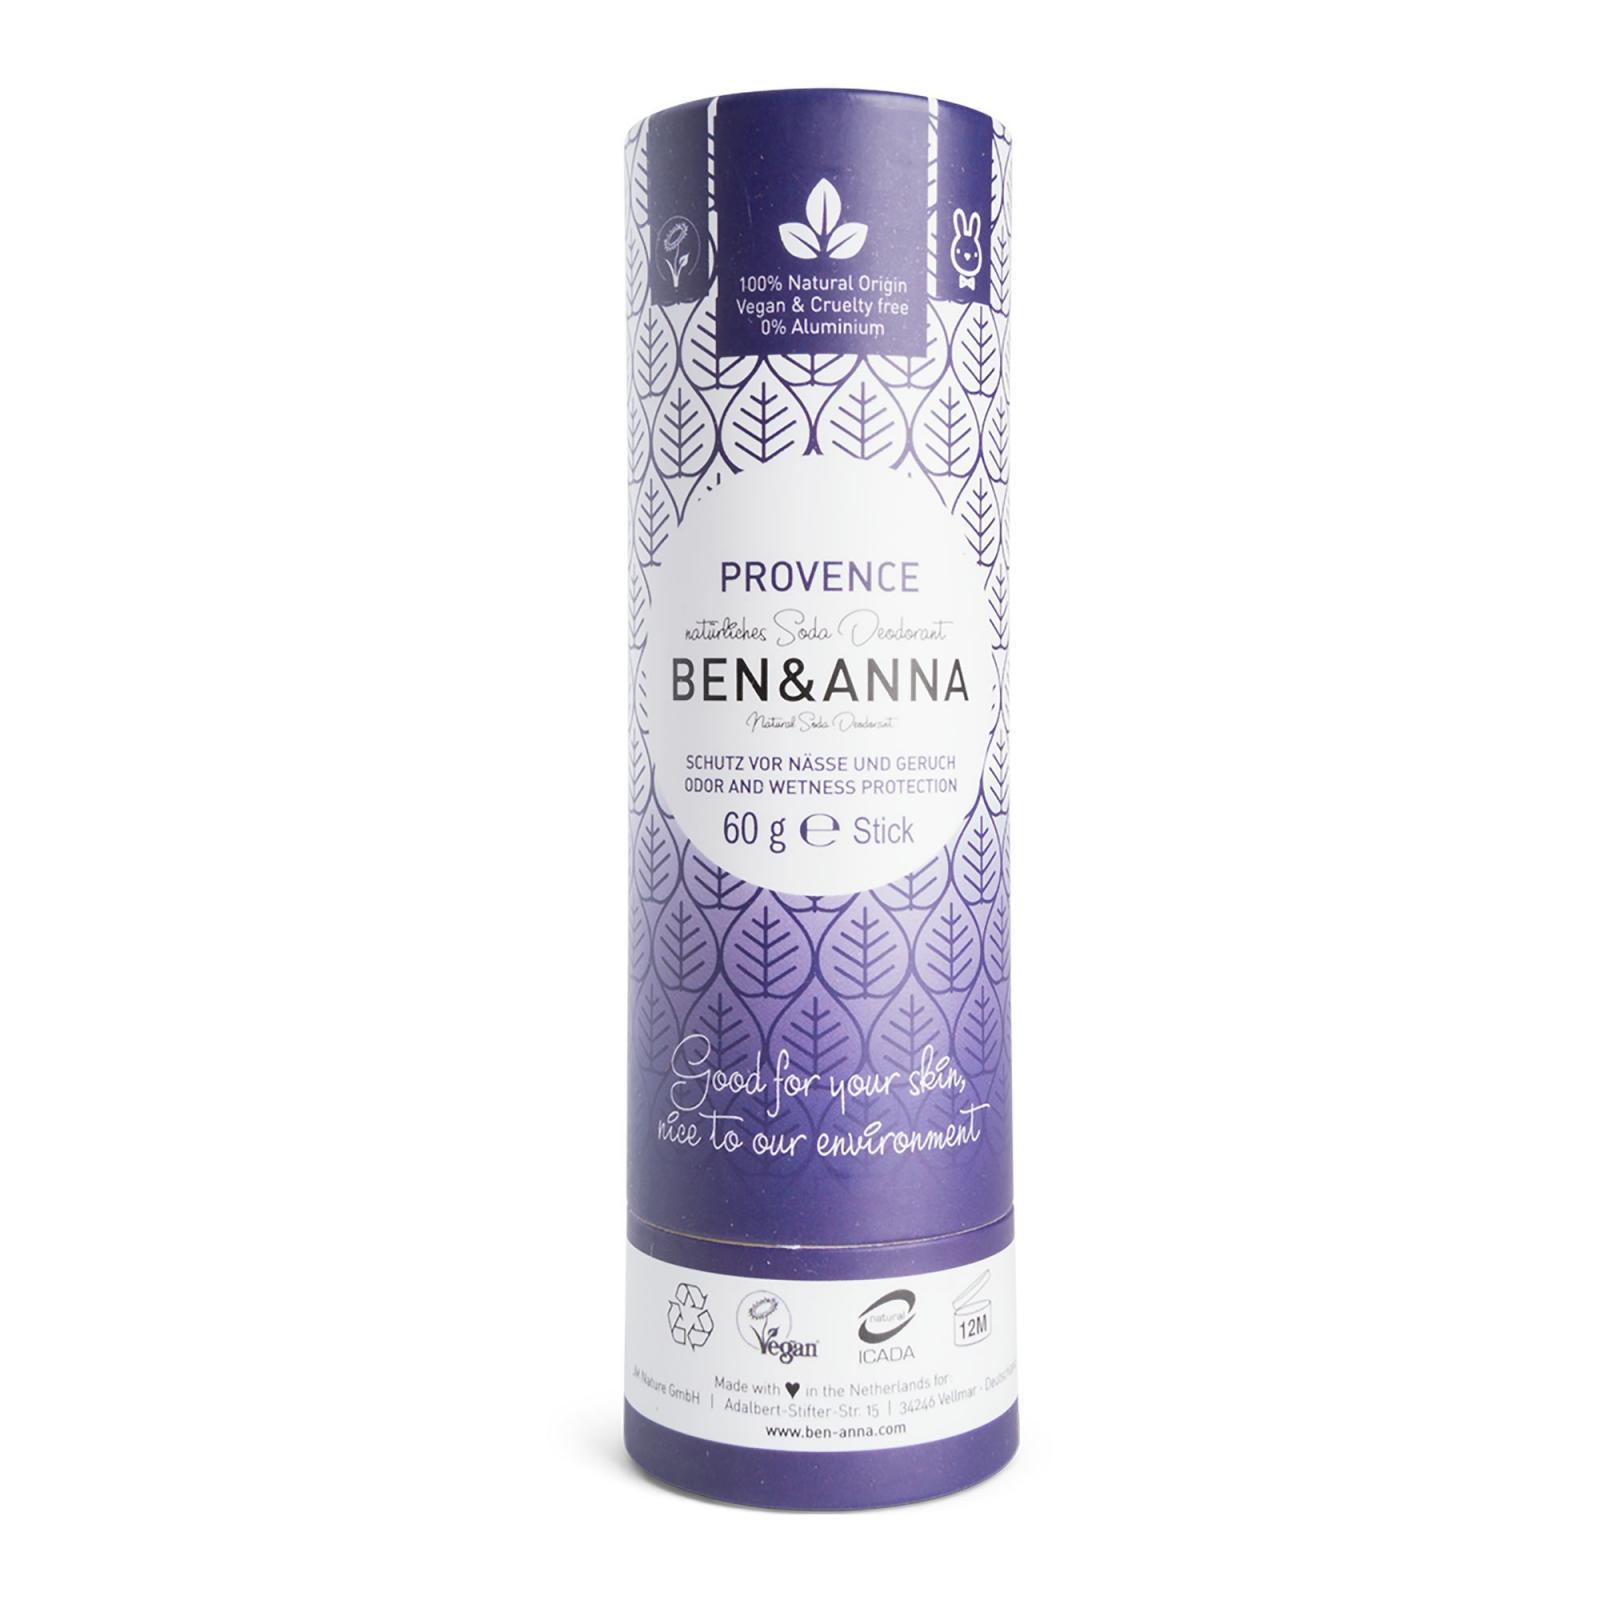 Ben & Anna Tuhý deodorant Provence 60 g, papírový obal